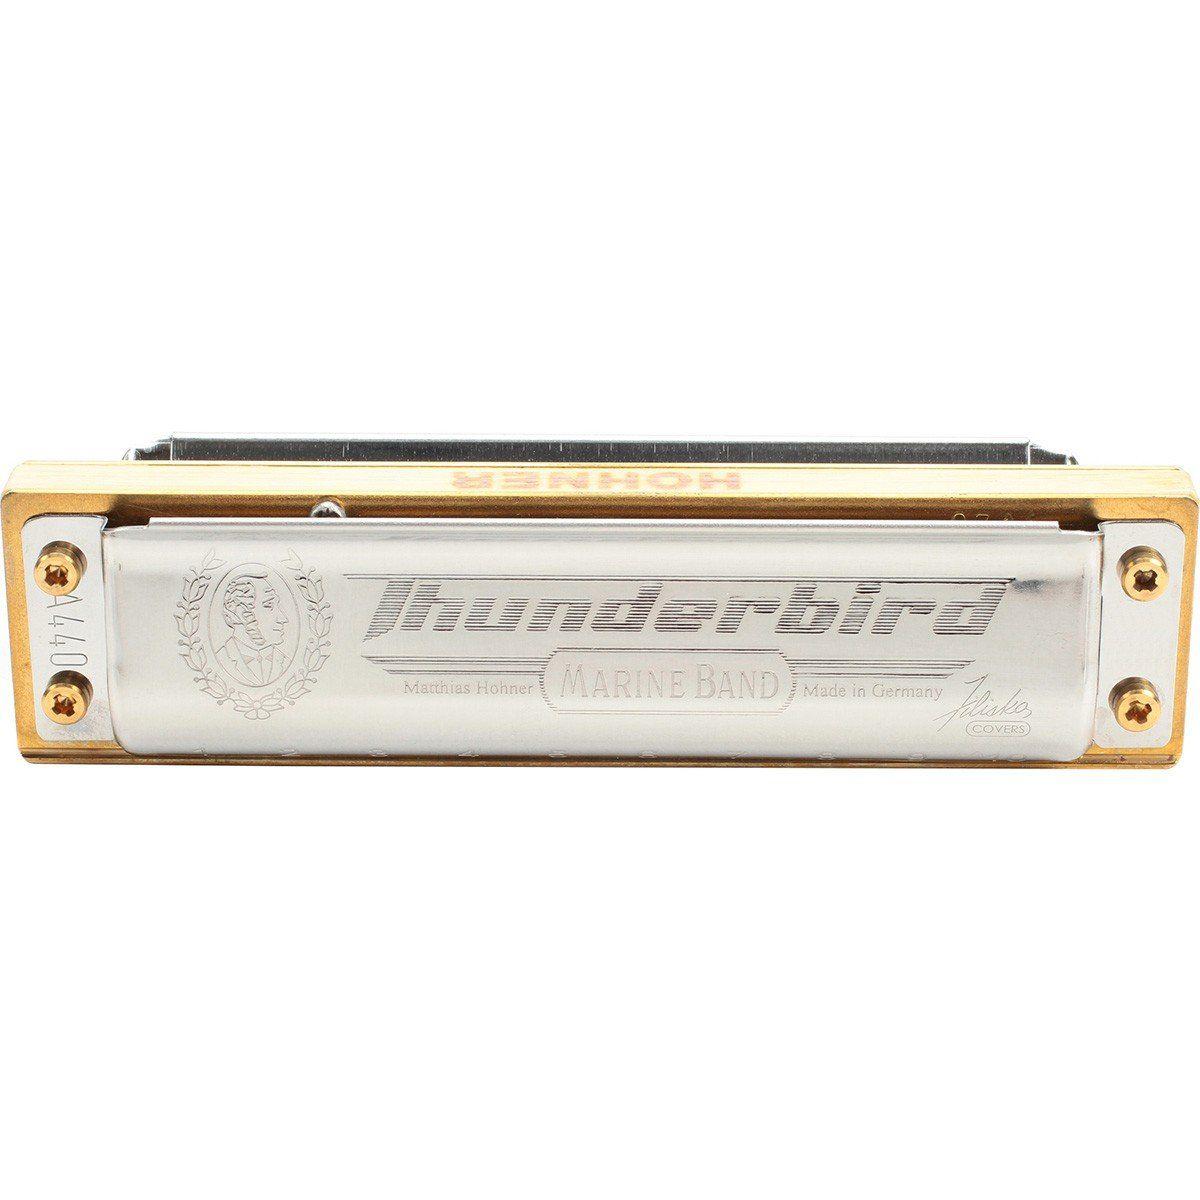 Hohner Marine Band ThunderBird Gaita Harmônica Alta Resposta de Grave e Volume